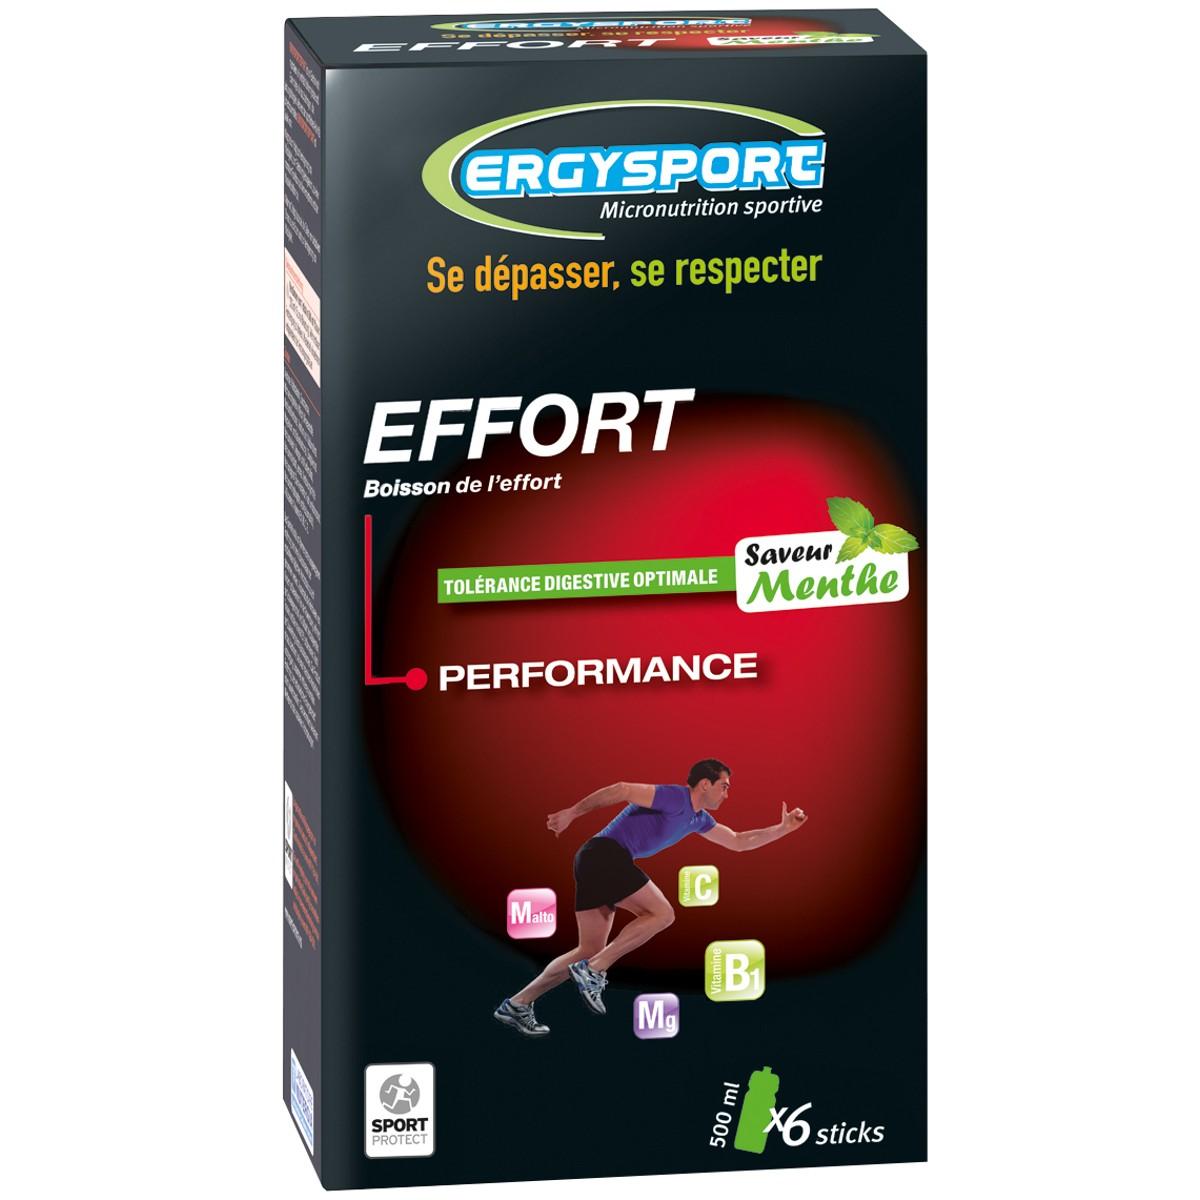 PACK OF SIX ERGYSPORT FOR EFFORT STICKS - MINT FLAVOUR